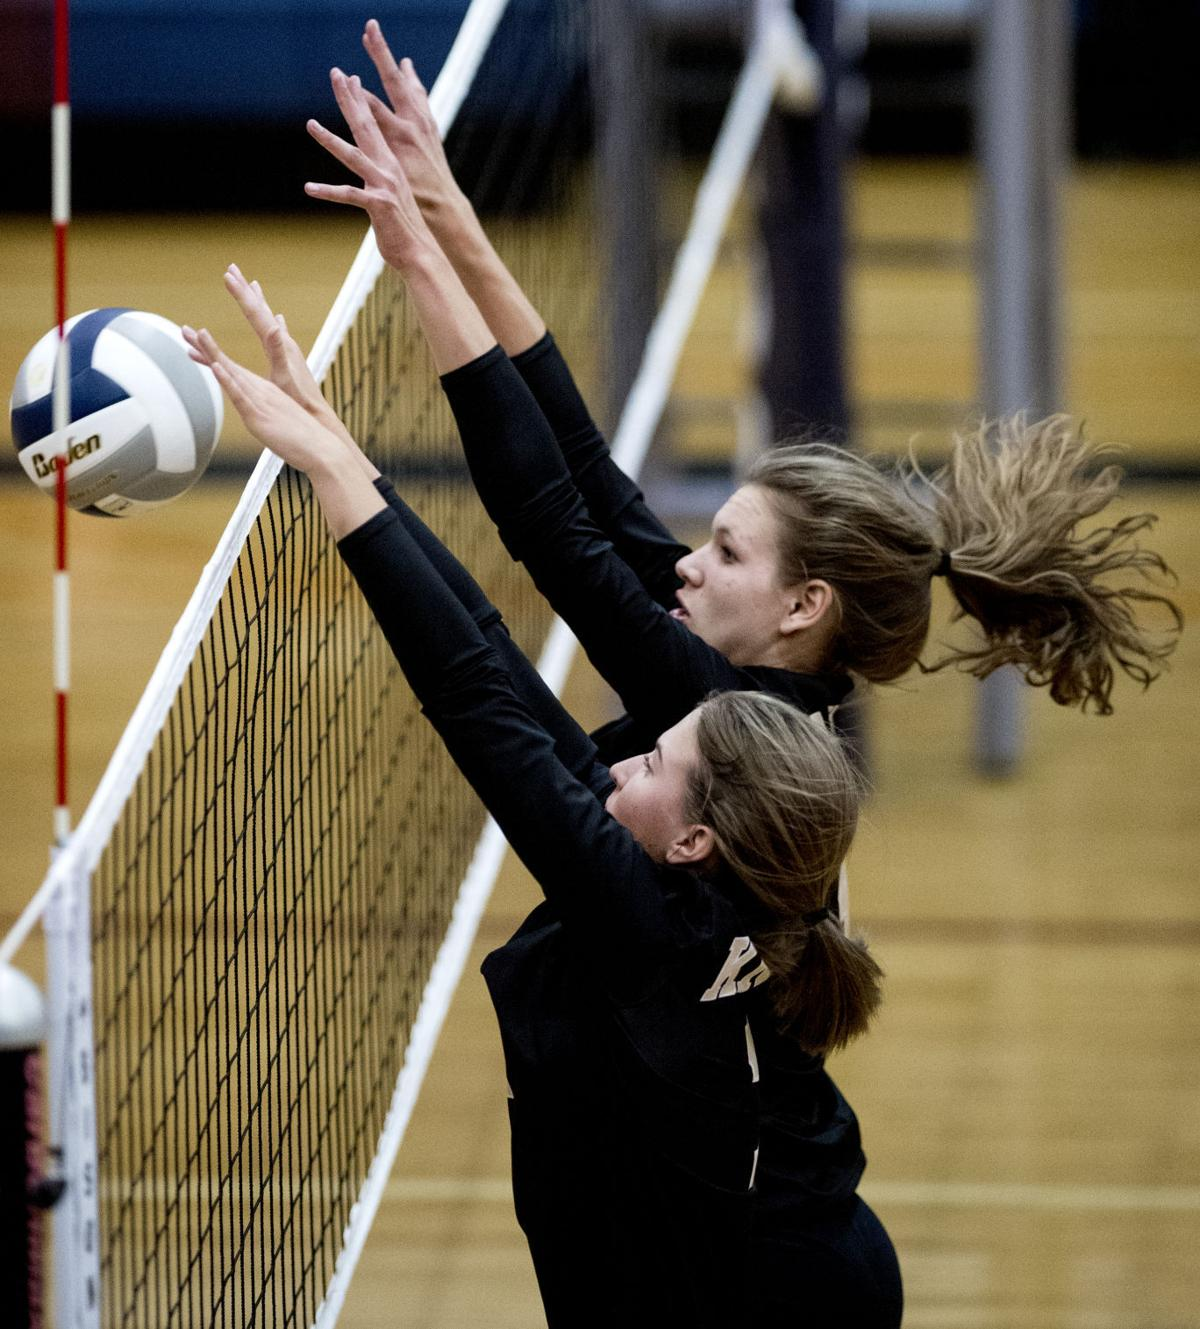 Southeast vs. North Star, prep volleyball, 9/12/17